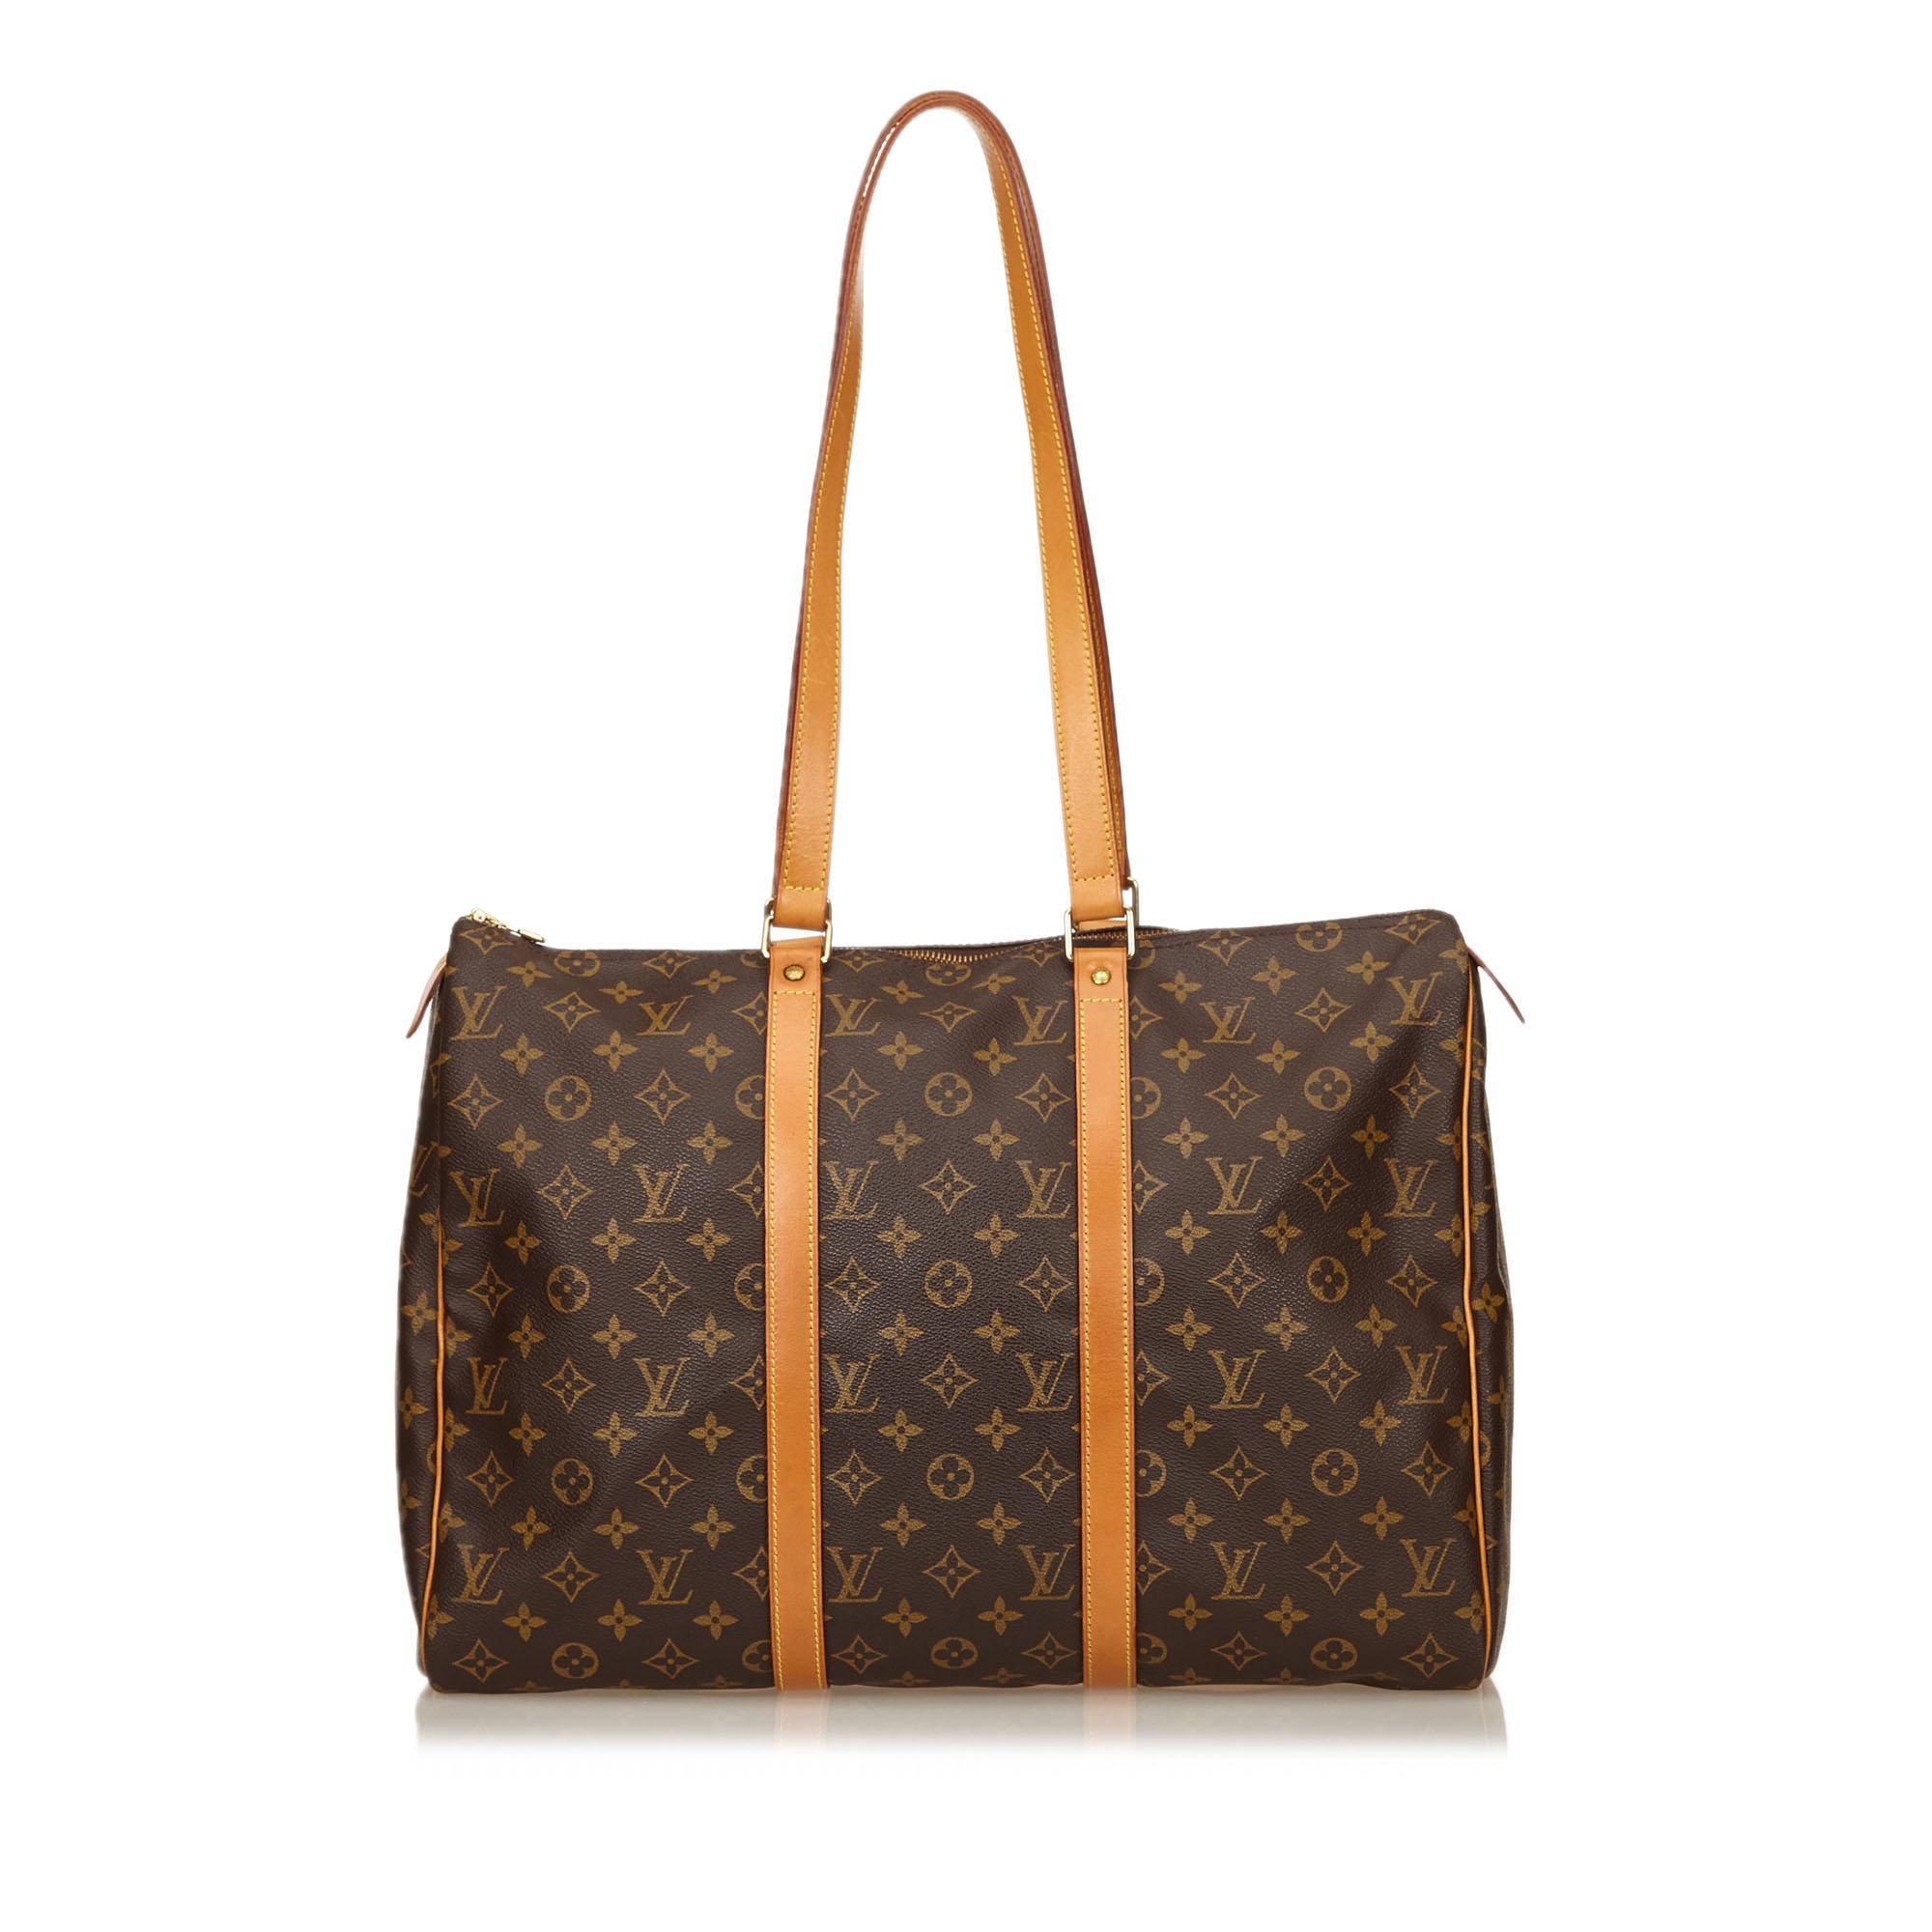 Louis Vuitton  Monogram Canvas  Luggage Sac Flanerie 45